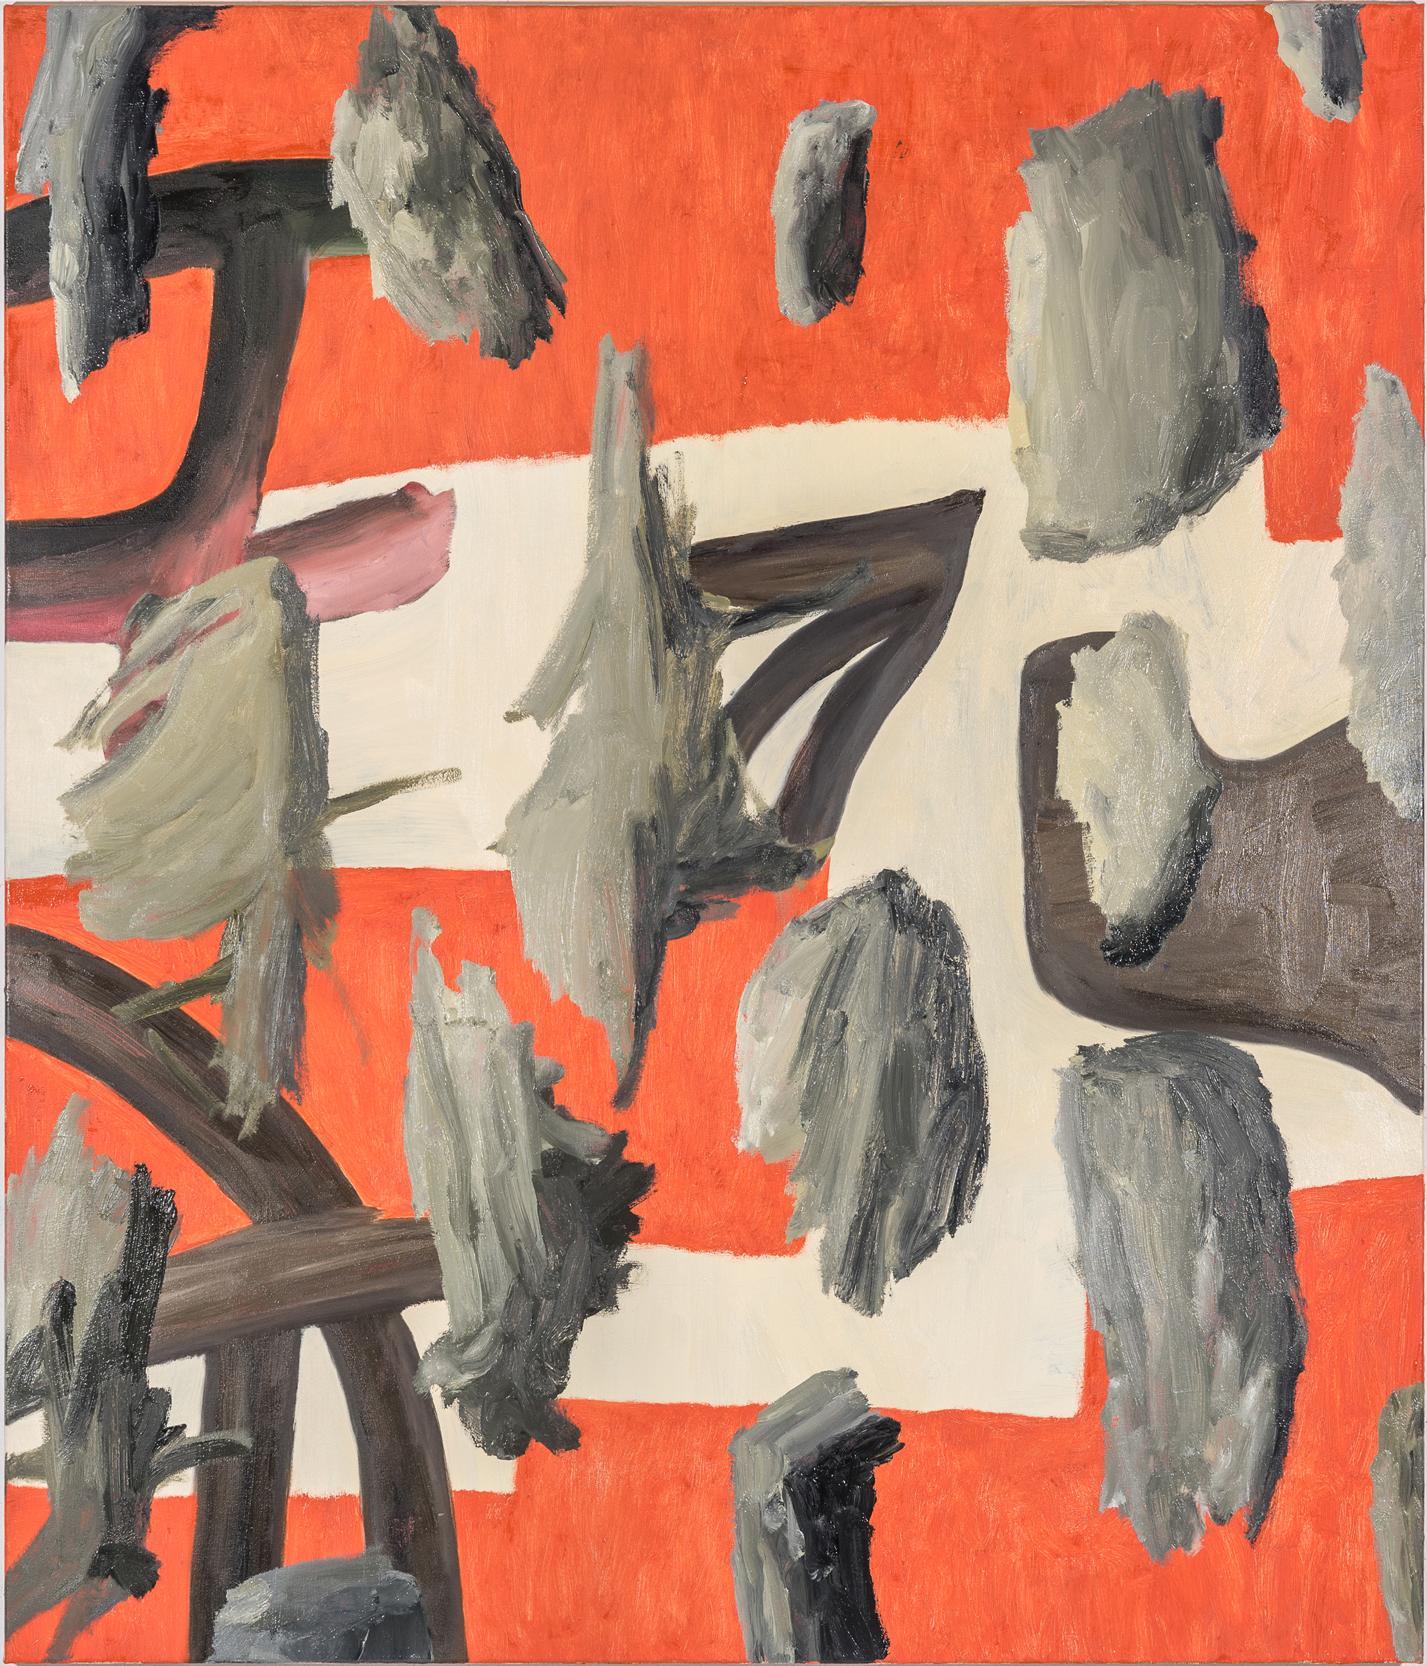 Veronika Hilger, untitled, 2018, oil on canvas, 150 x 130 cm